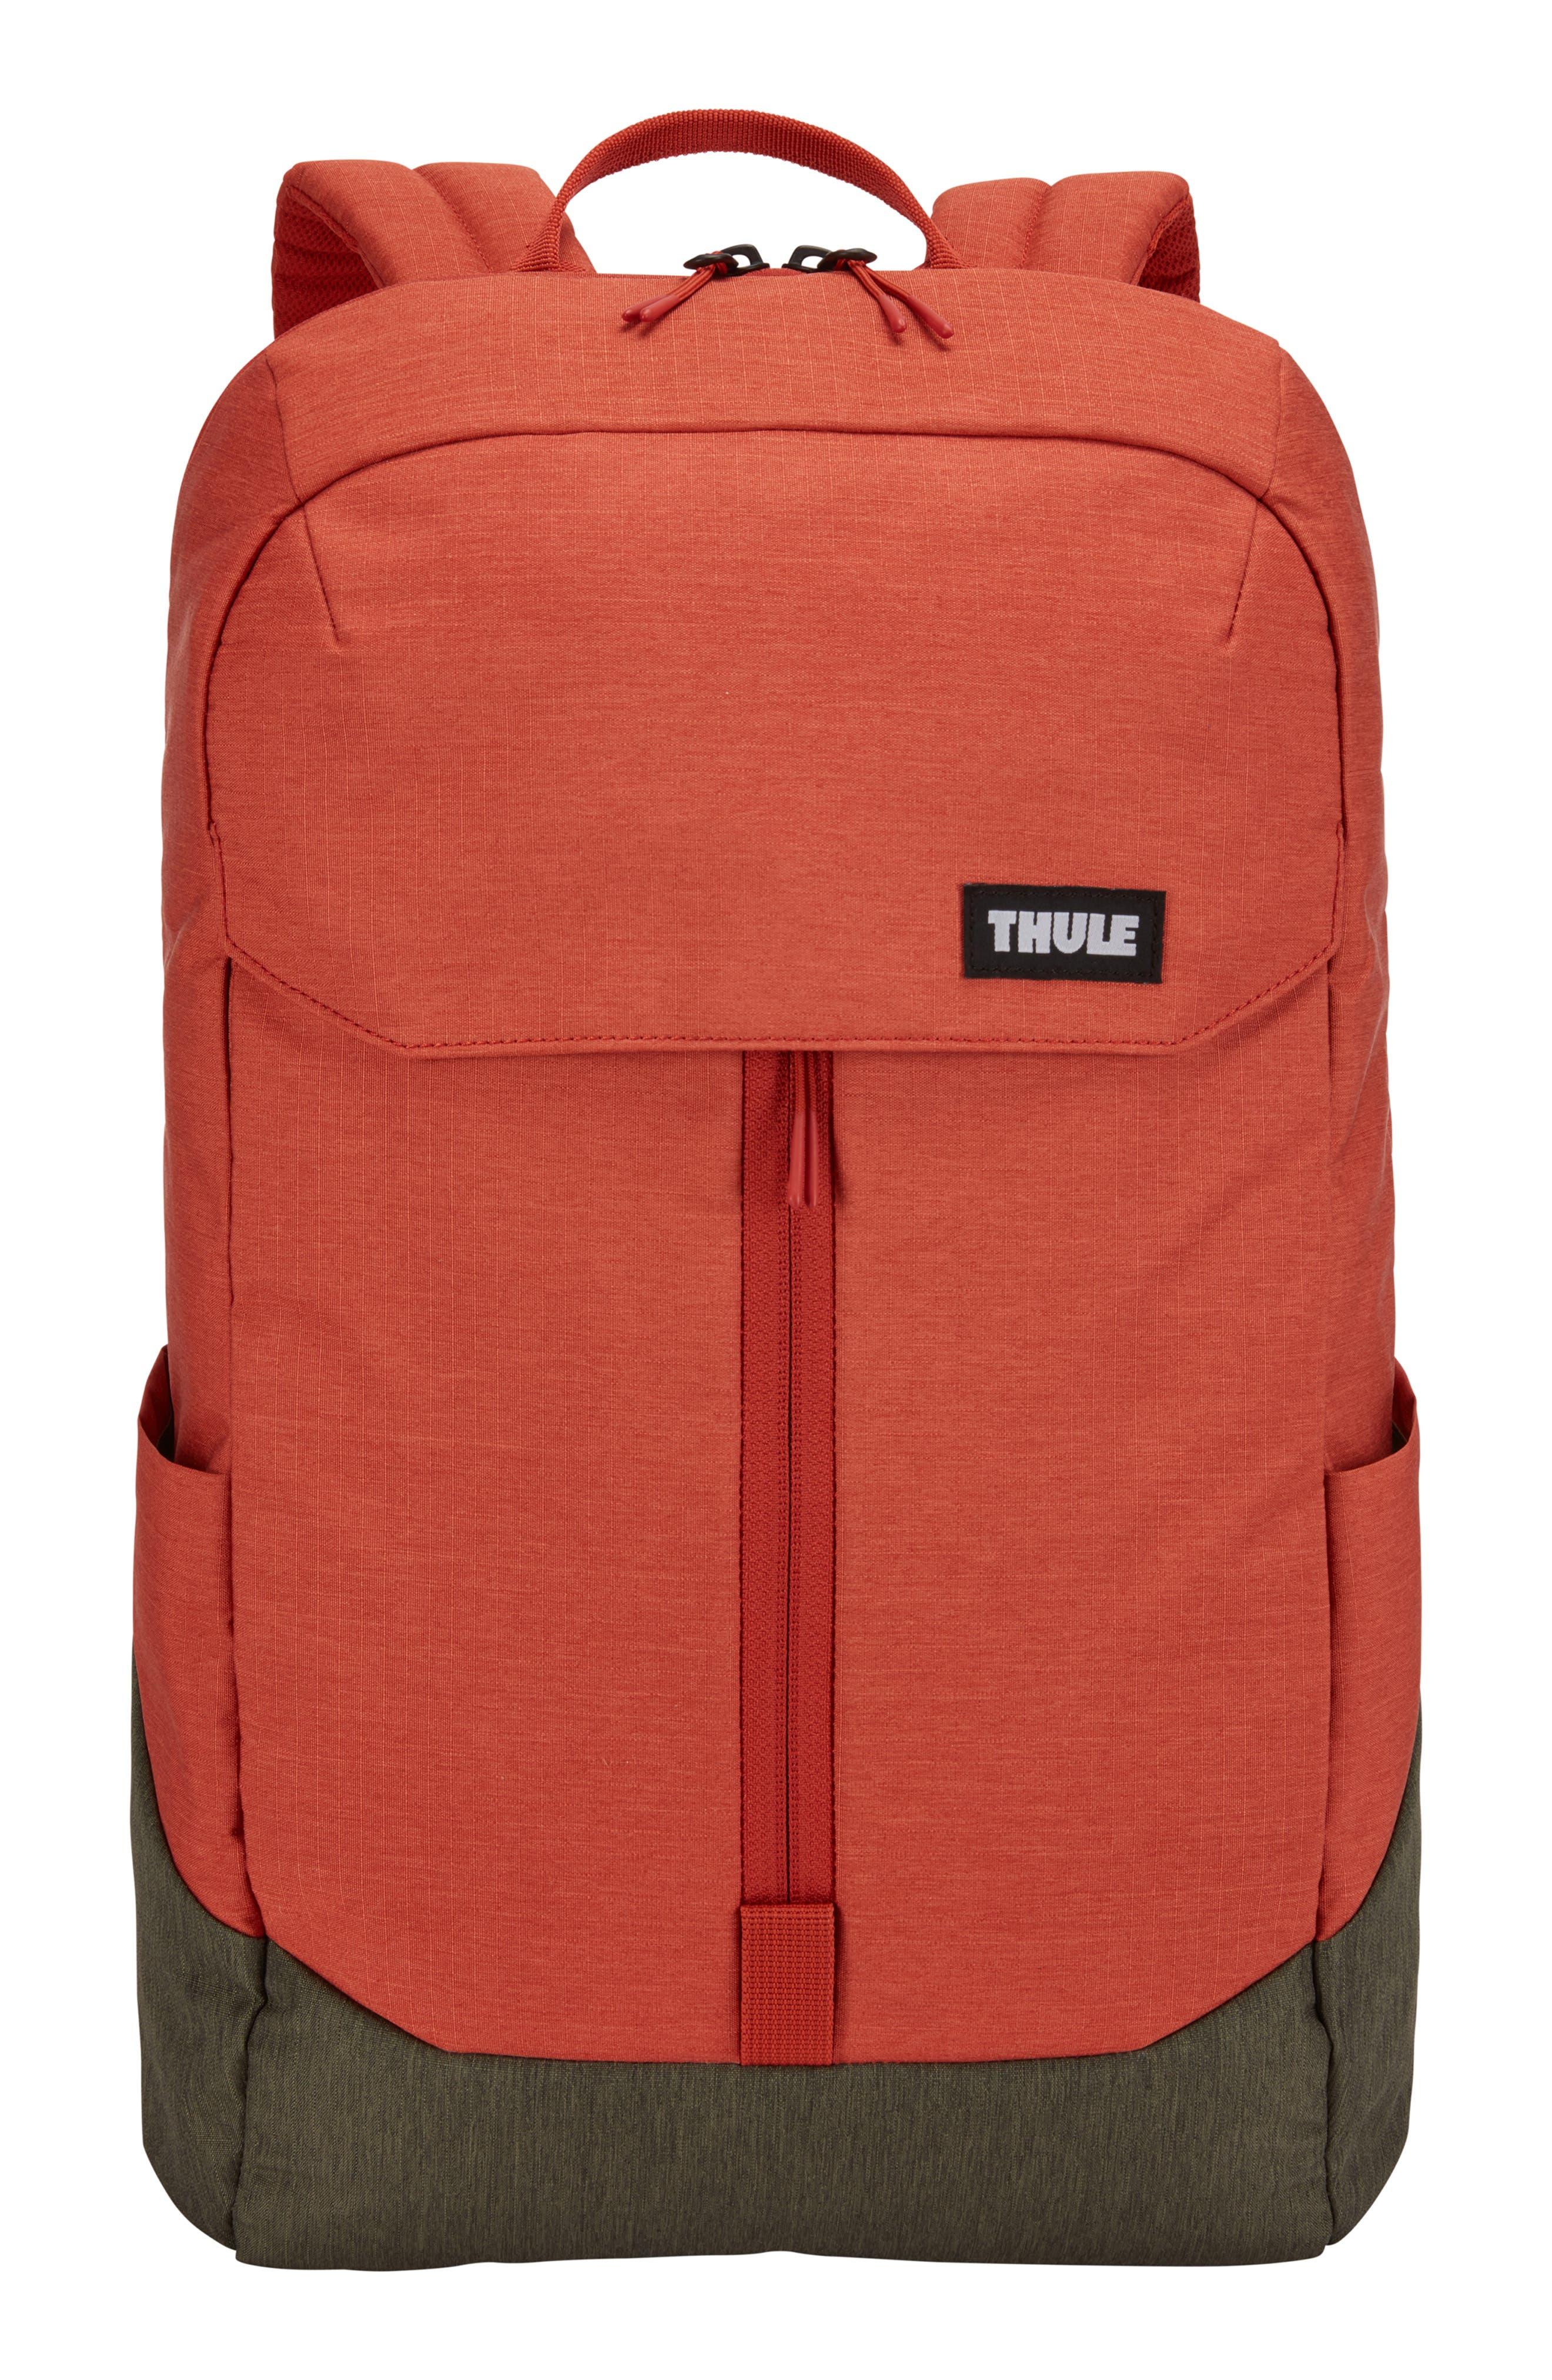 Thule Lithos Backpack - Orange